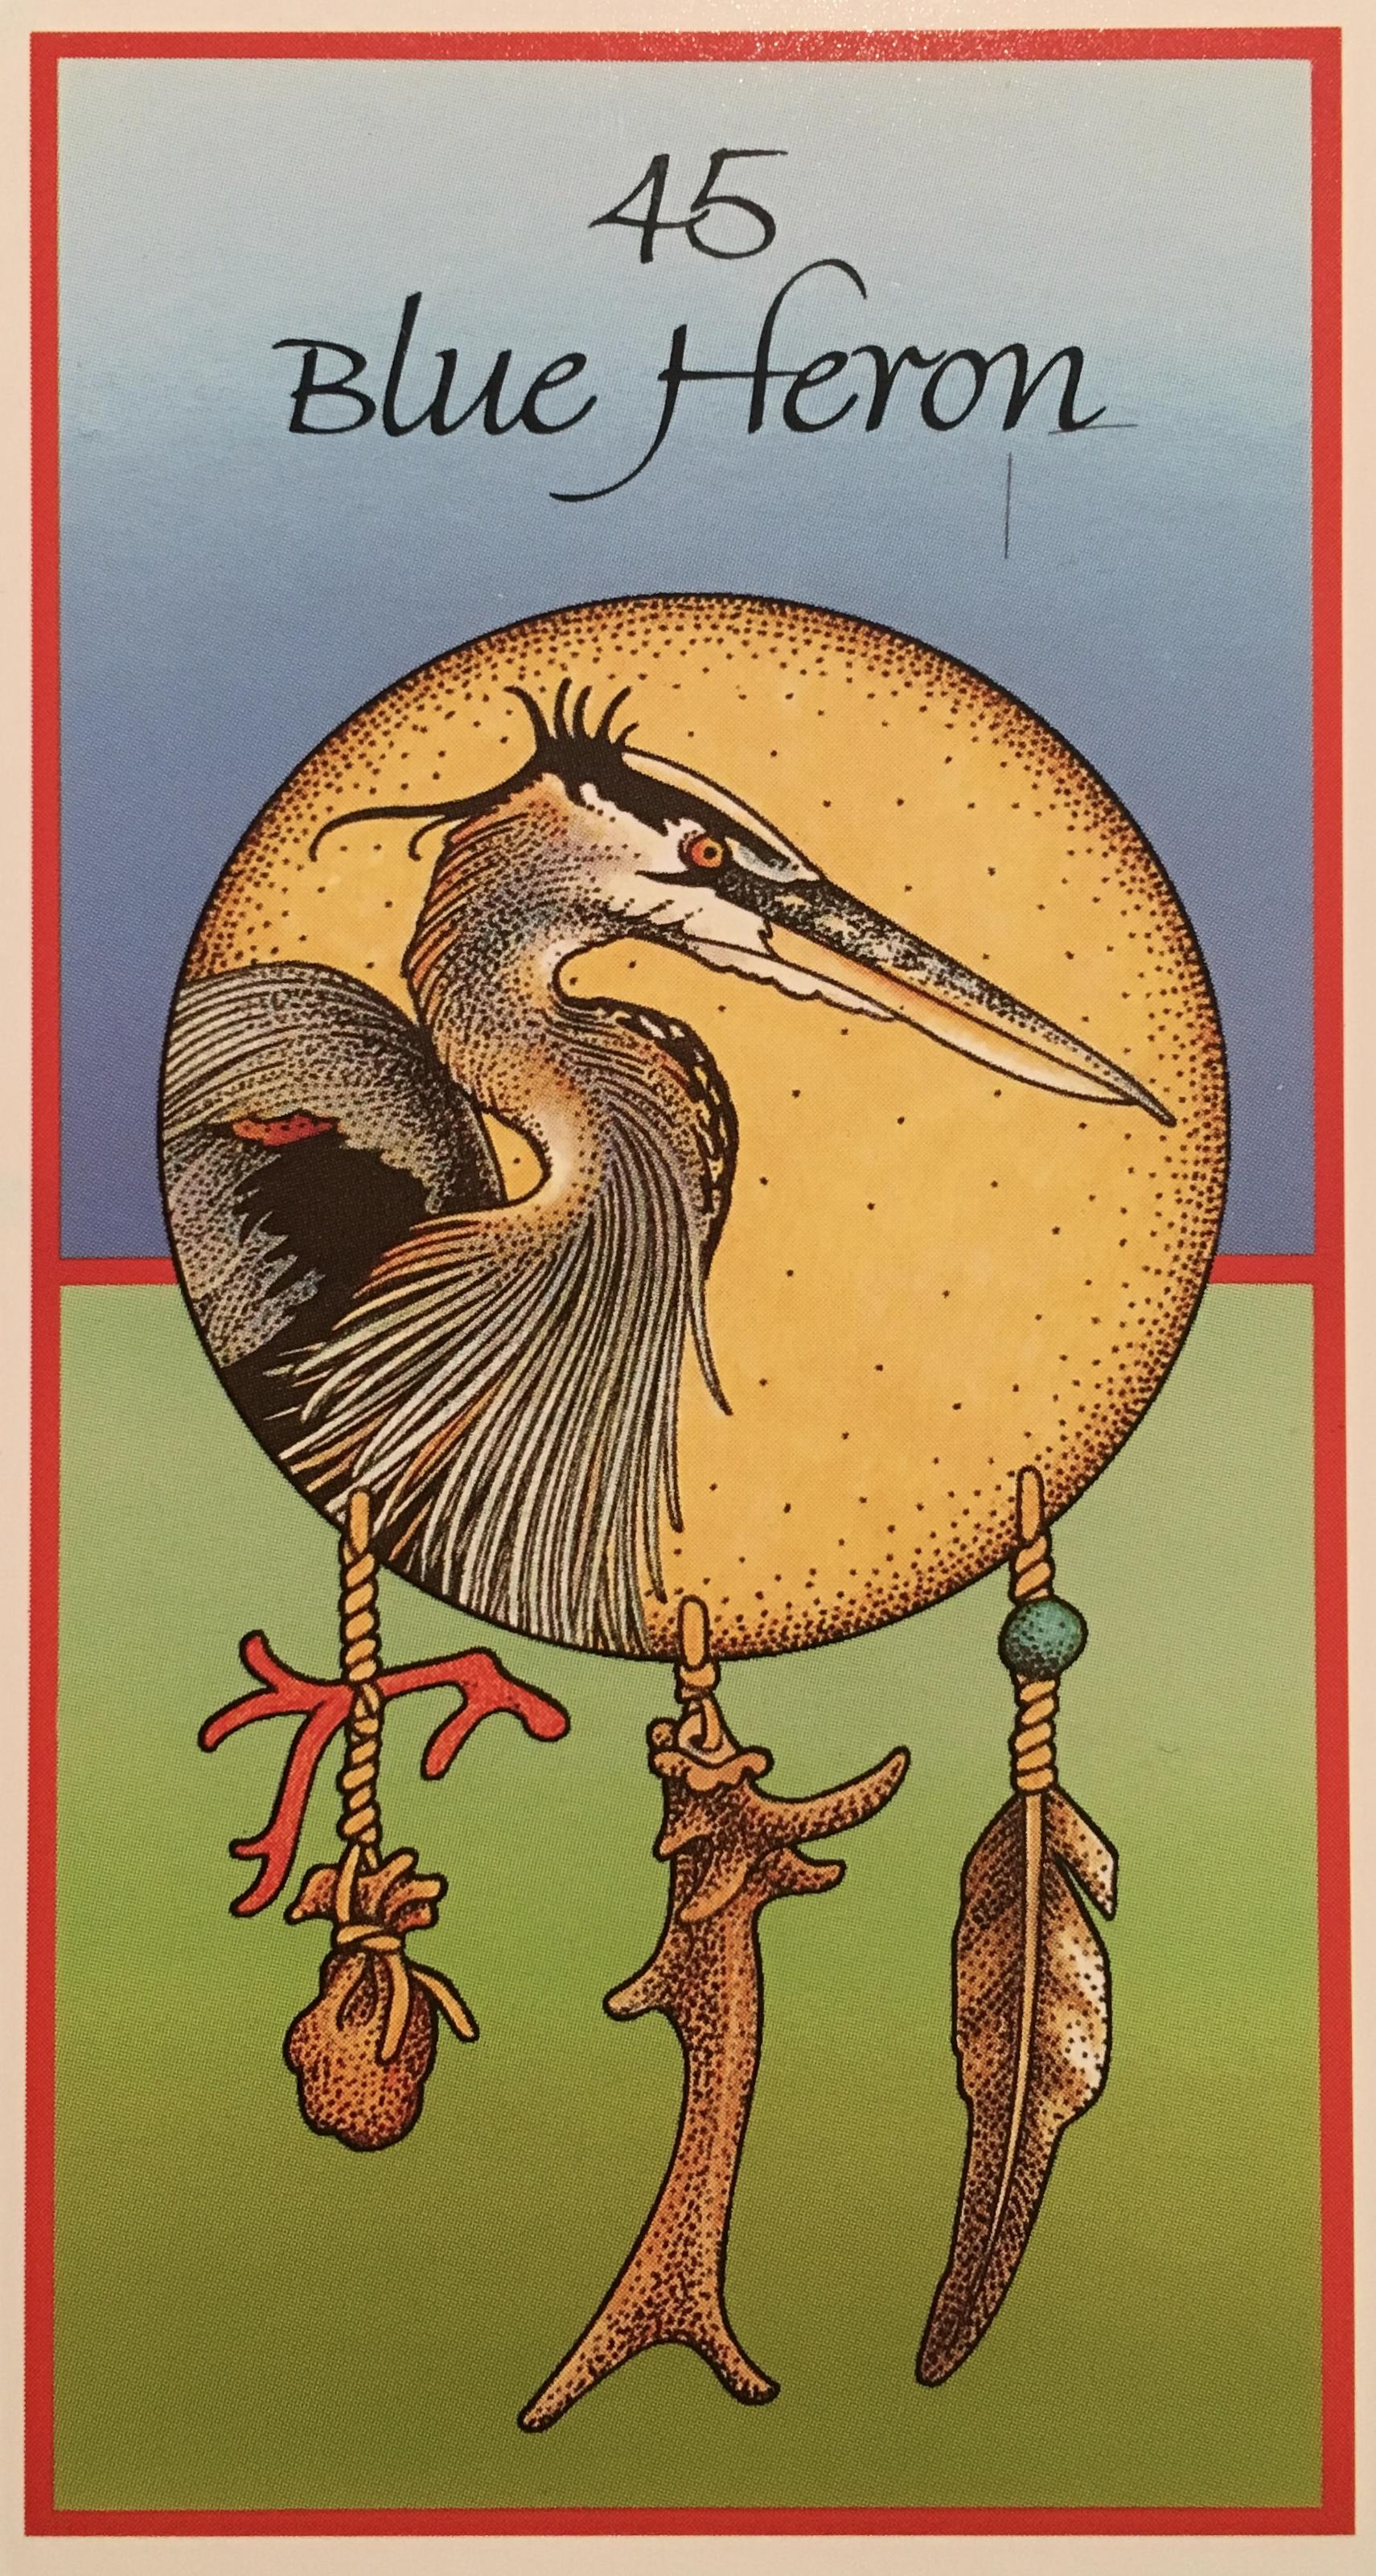 Blue Heron Archangel Oracle Divine Guidance